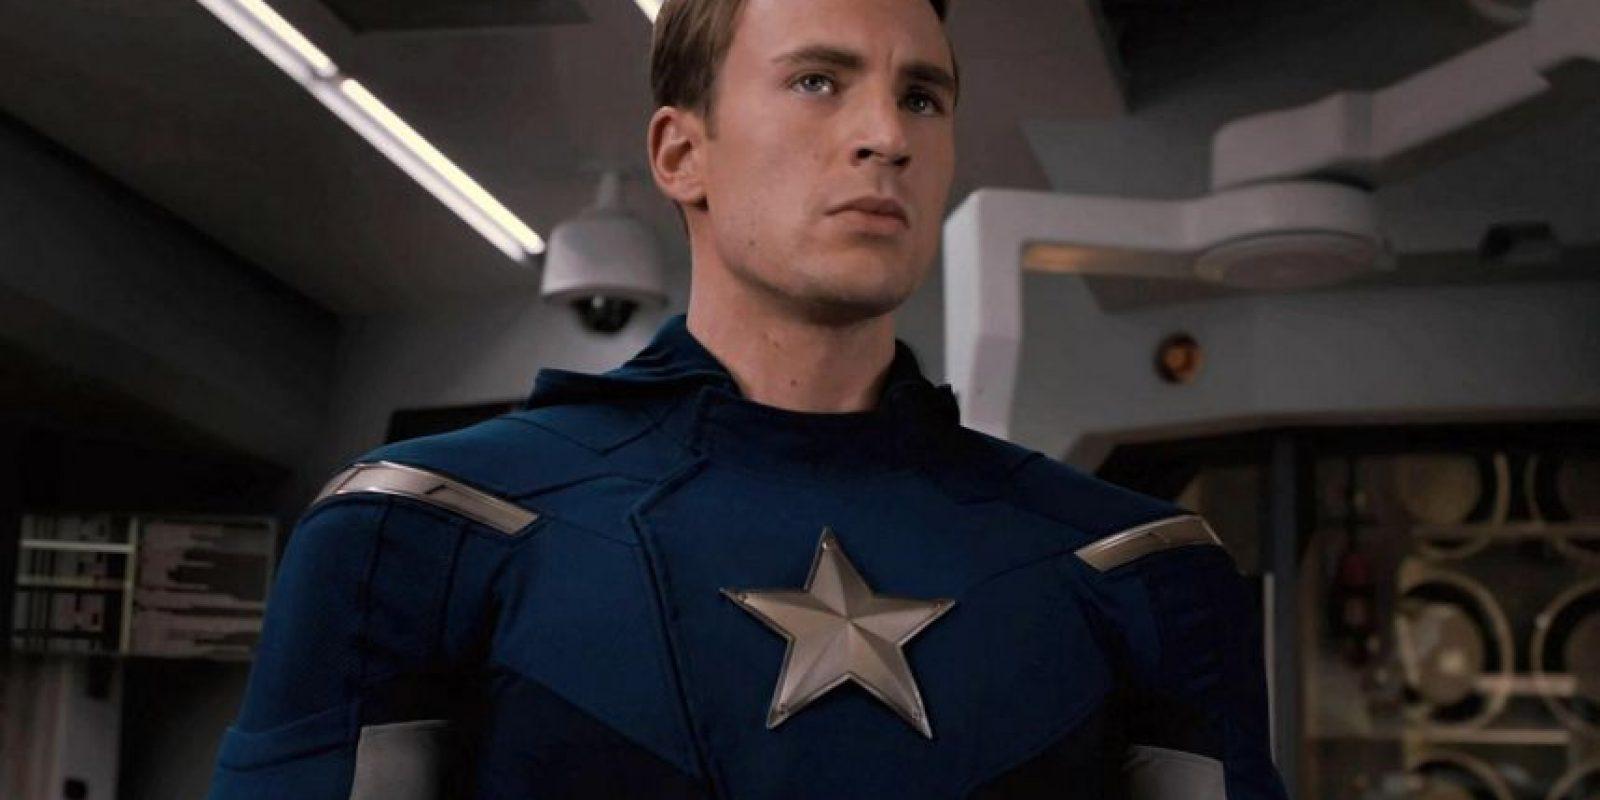 Chris Evans es Capitán América Foto:Facebook